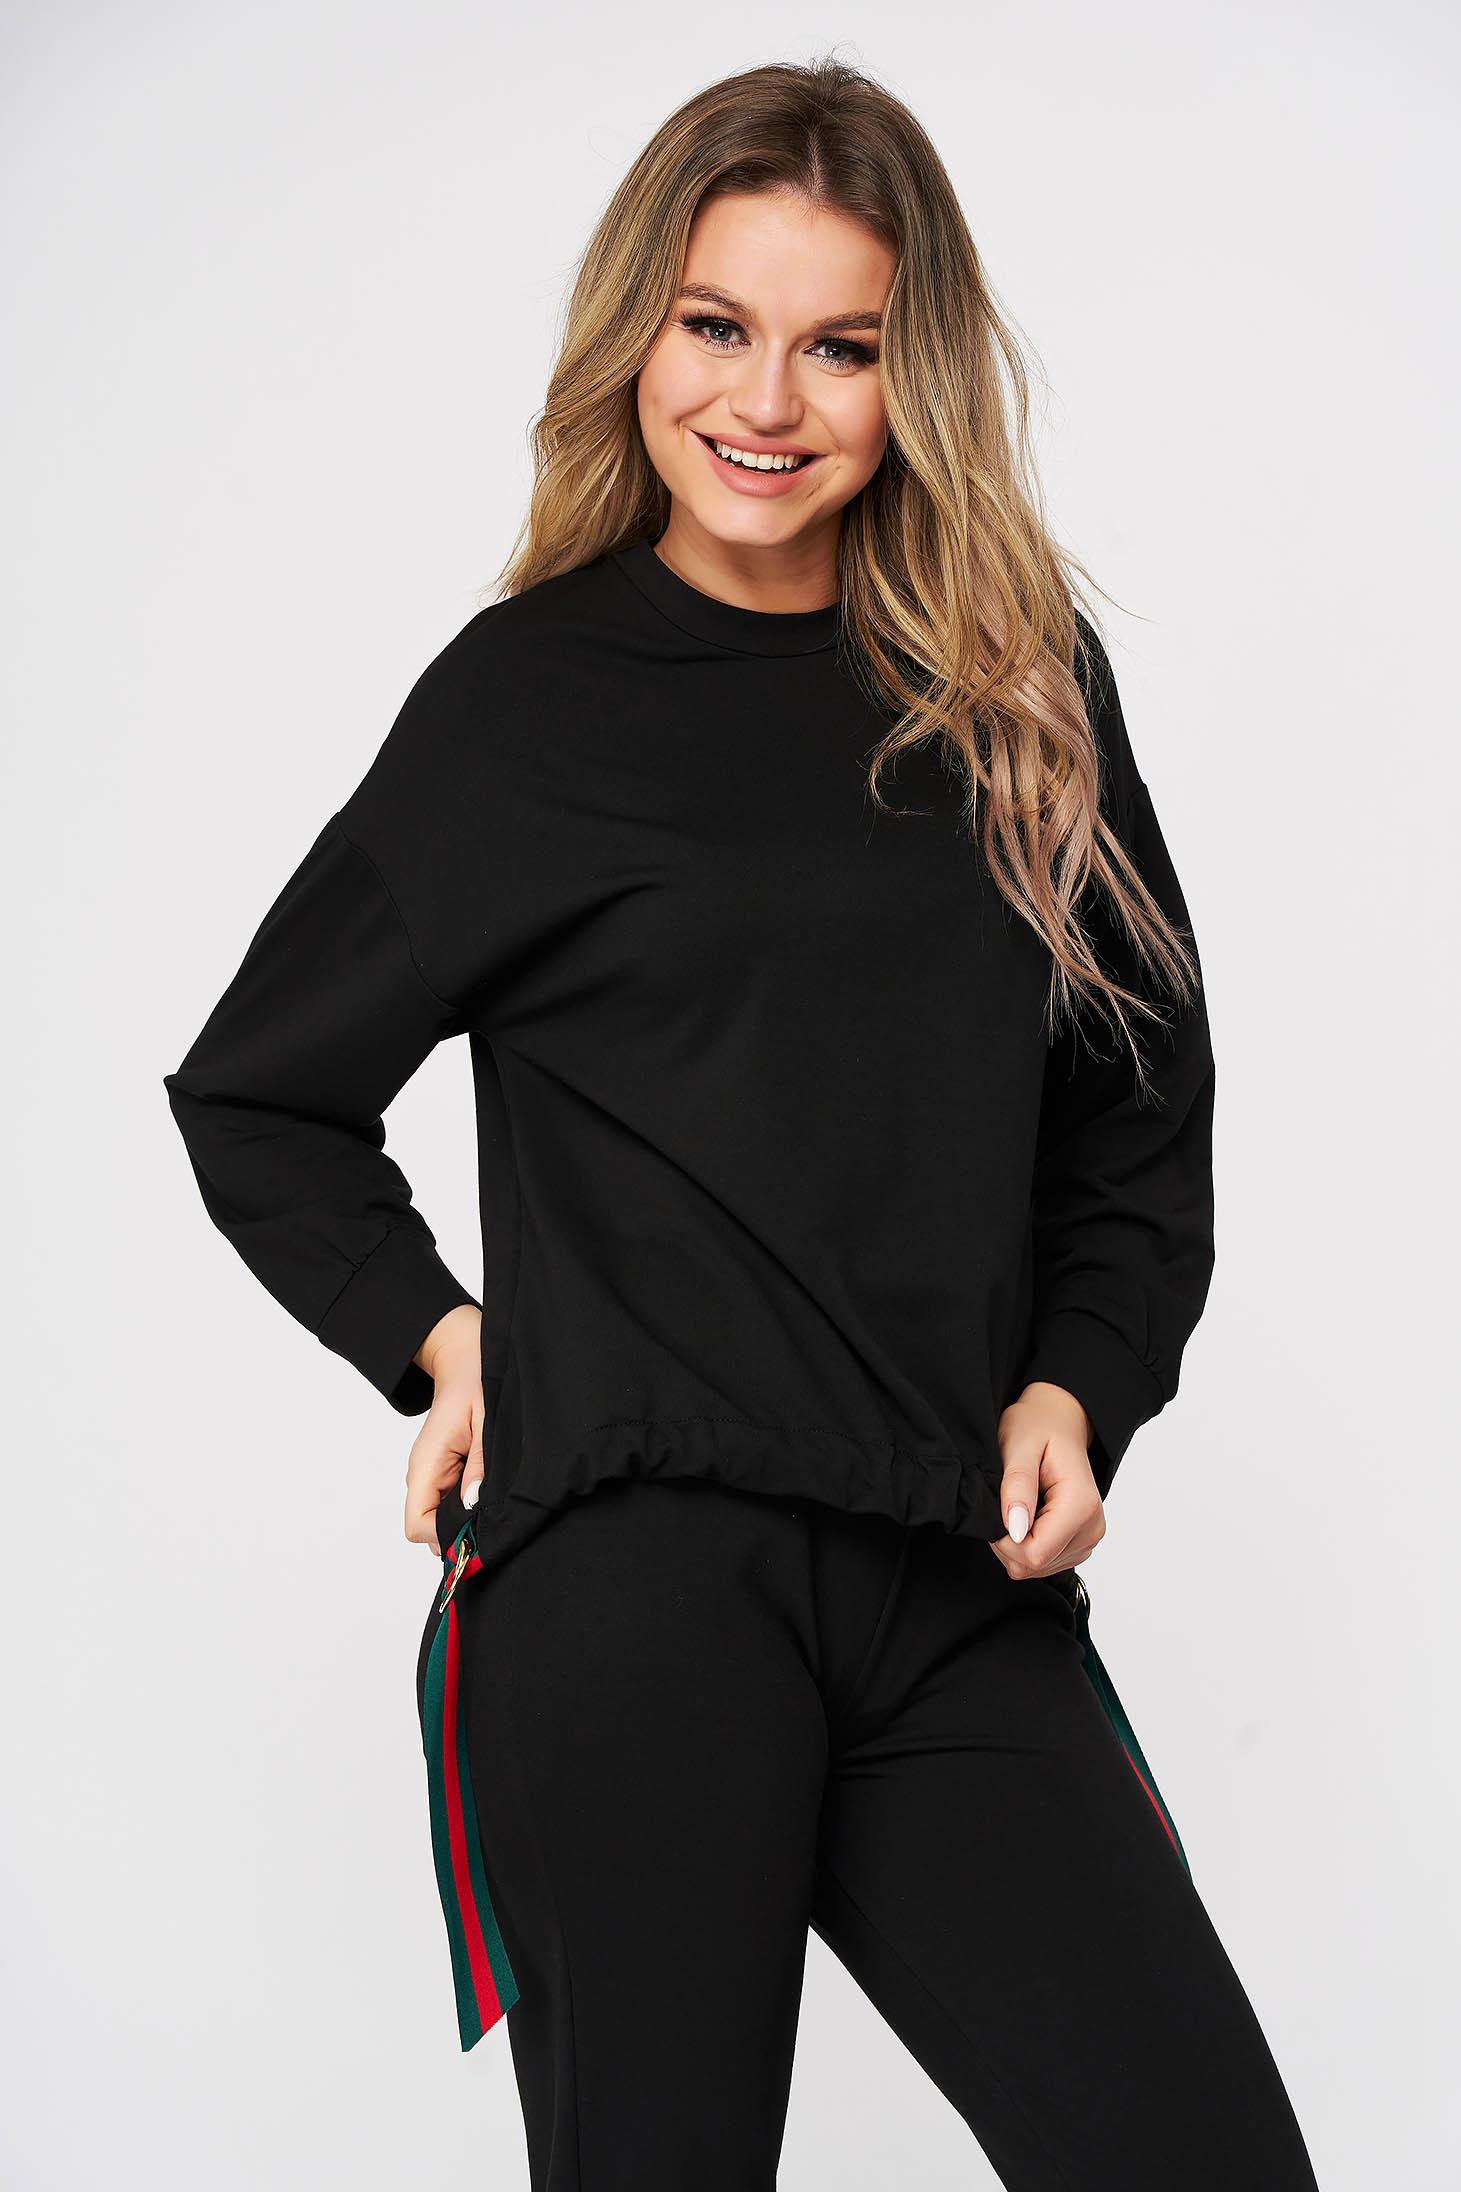 Bluza dama StarShinerS neagra sport din material moale cu croi larg si inele metalice decorative